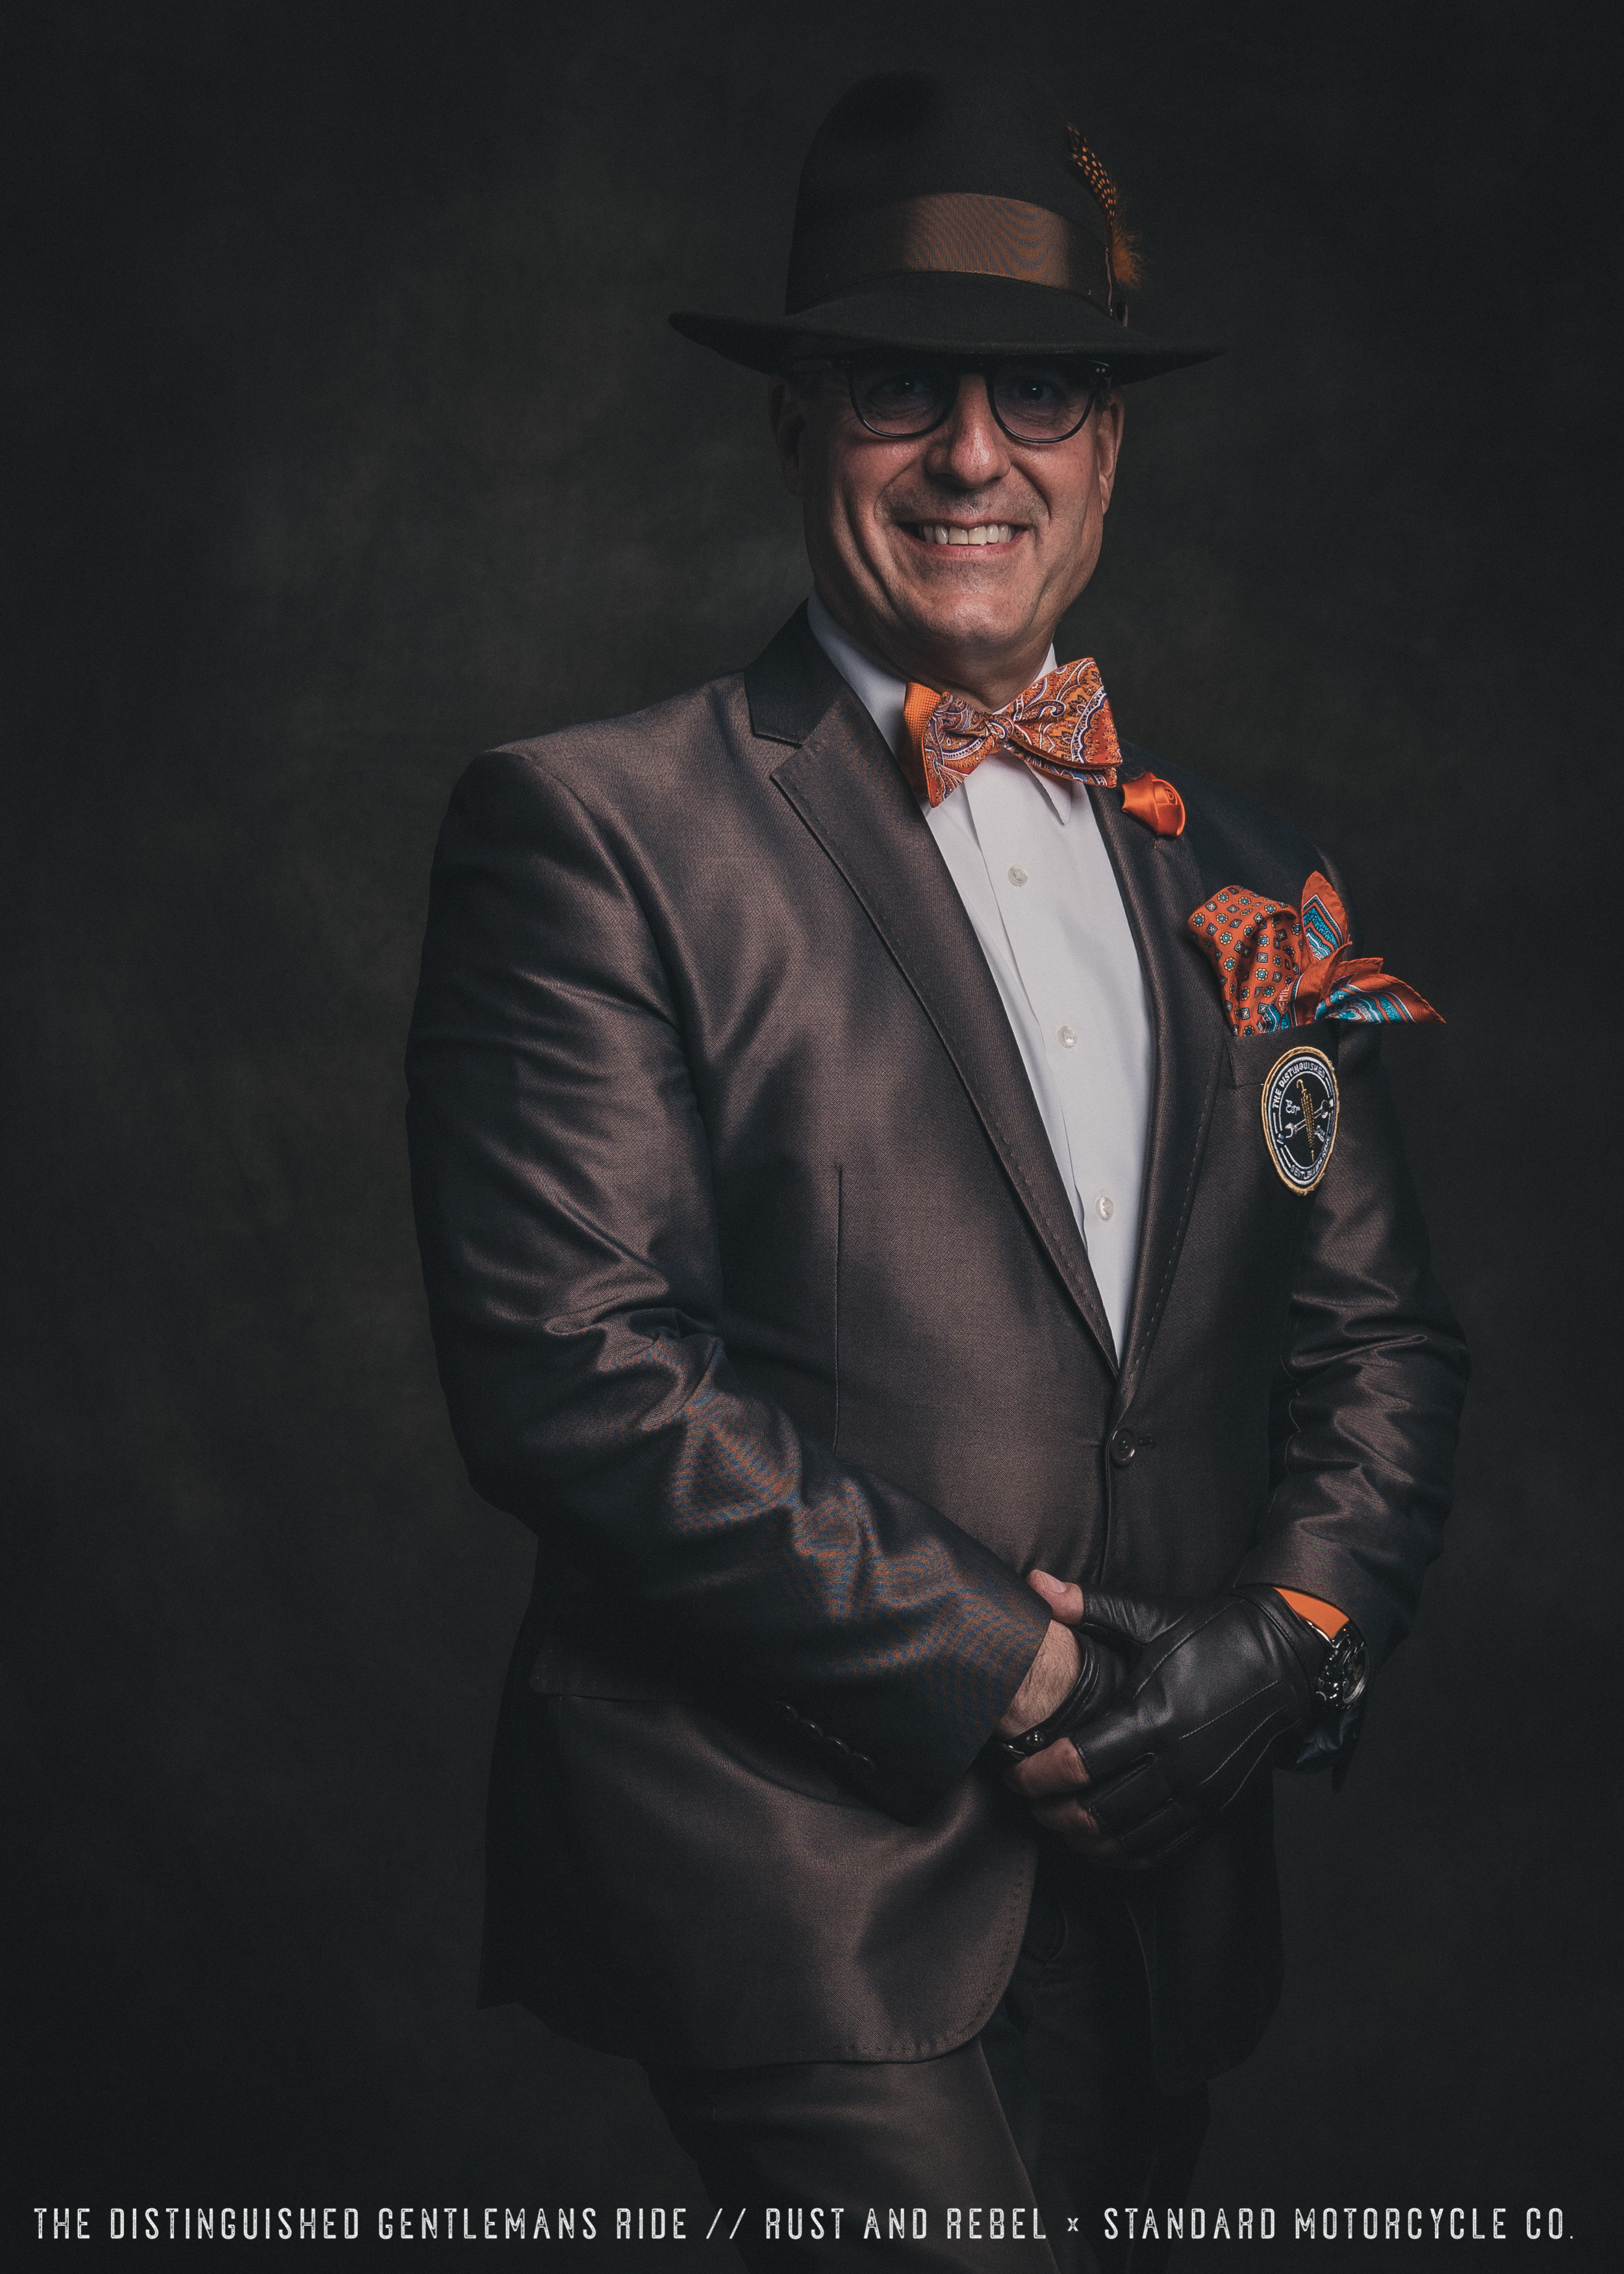 The Distinguished Gentleman's Ride 2019 [PEOPLE - PHOTO BY @MIKEDUNNUSA] - 0048.jpg